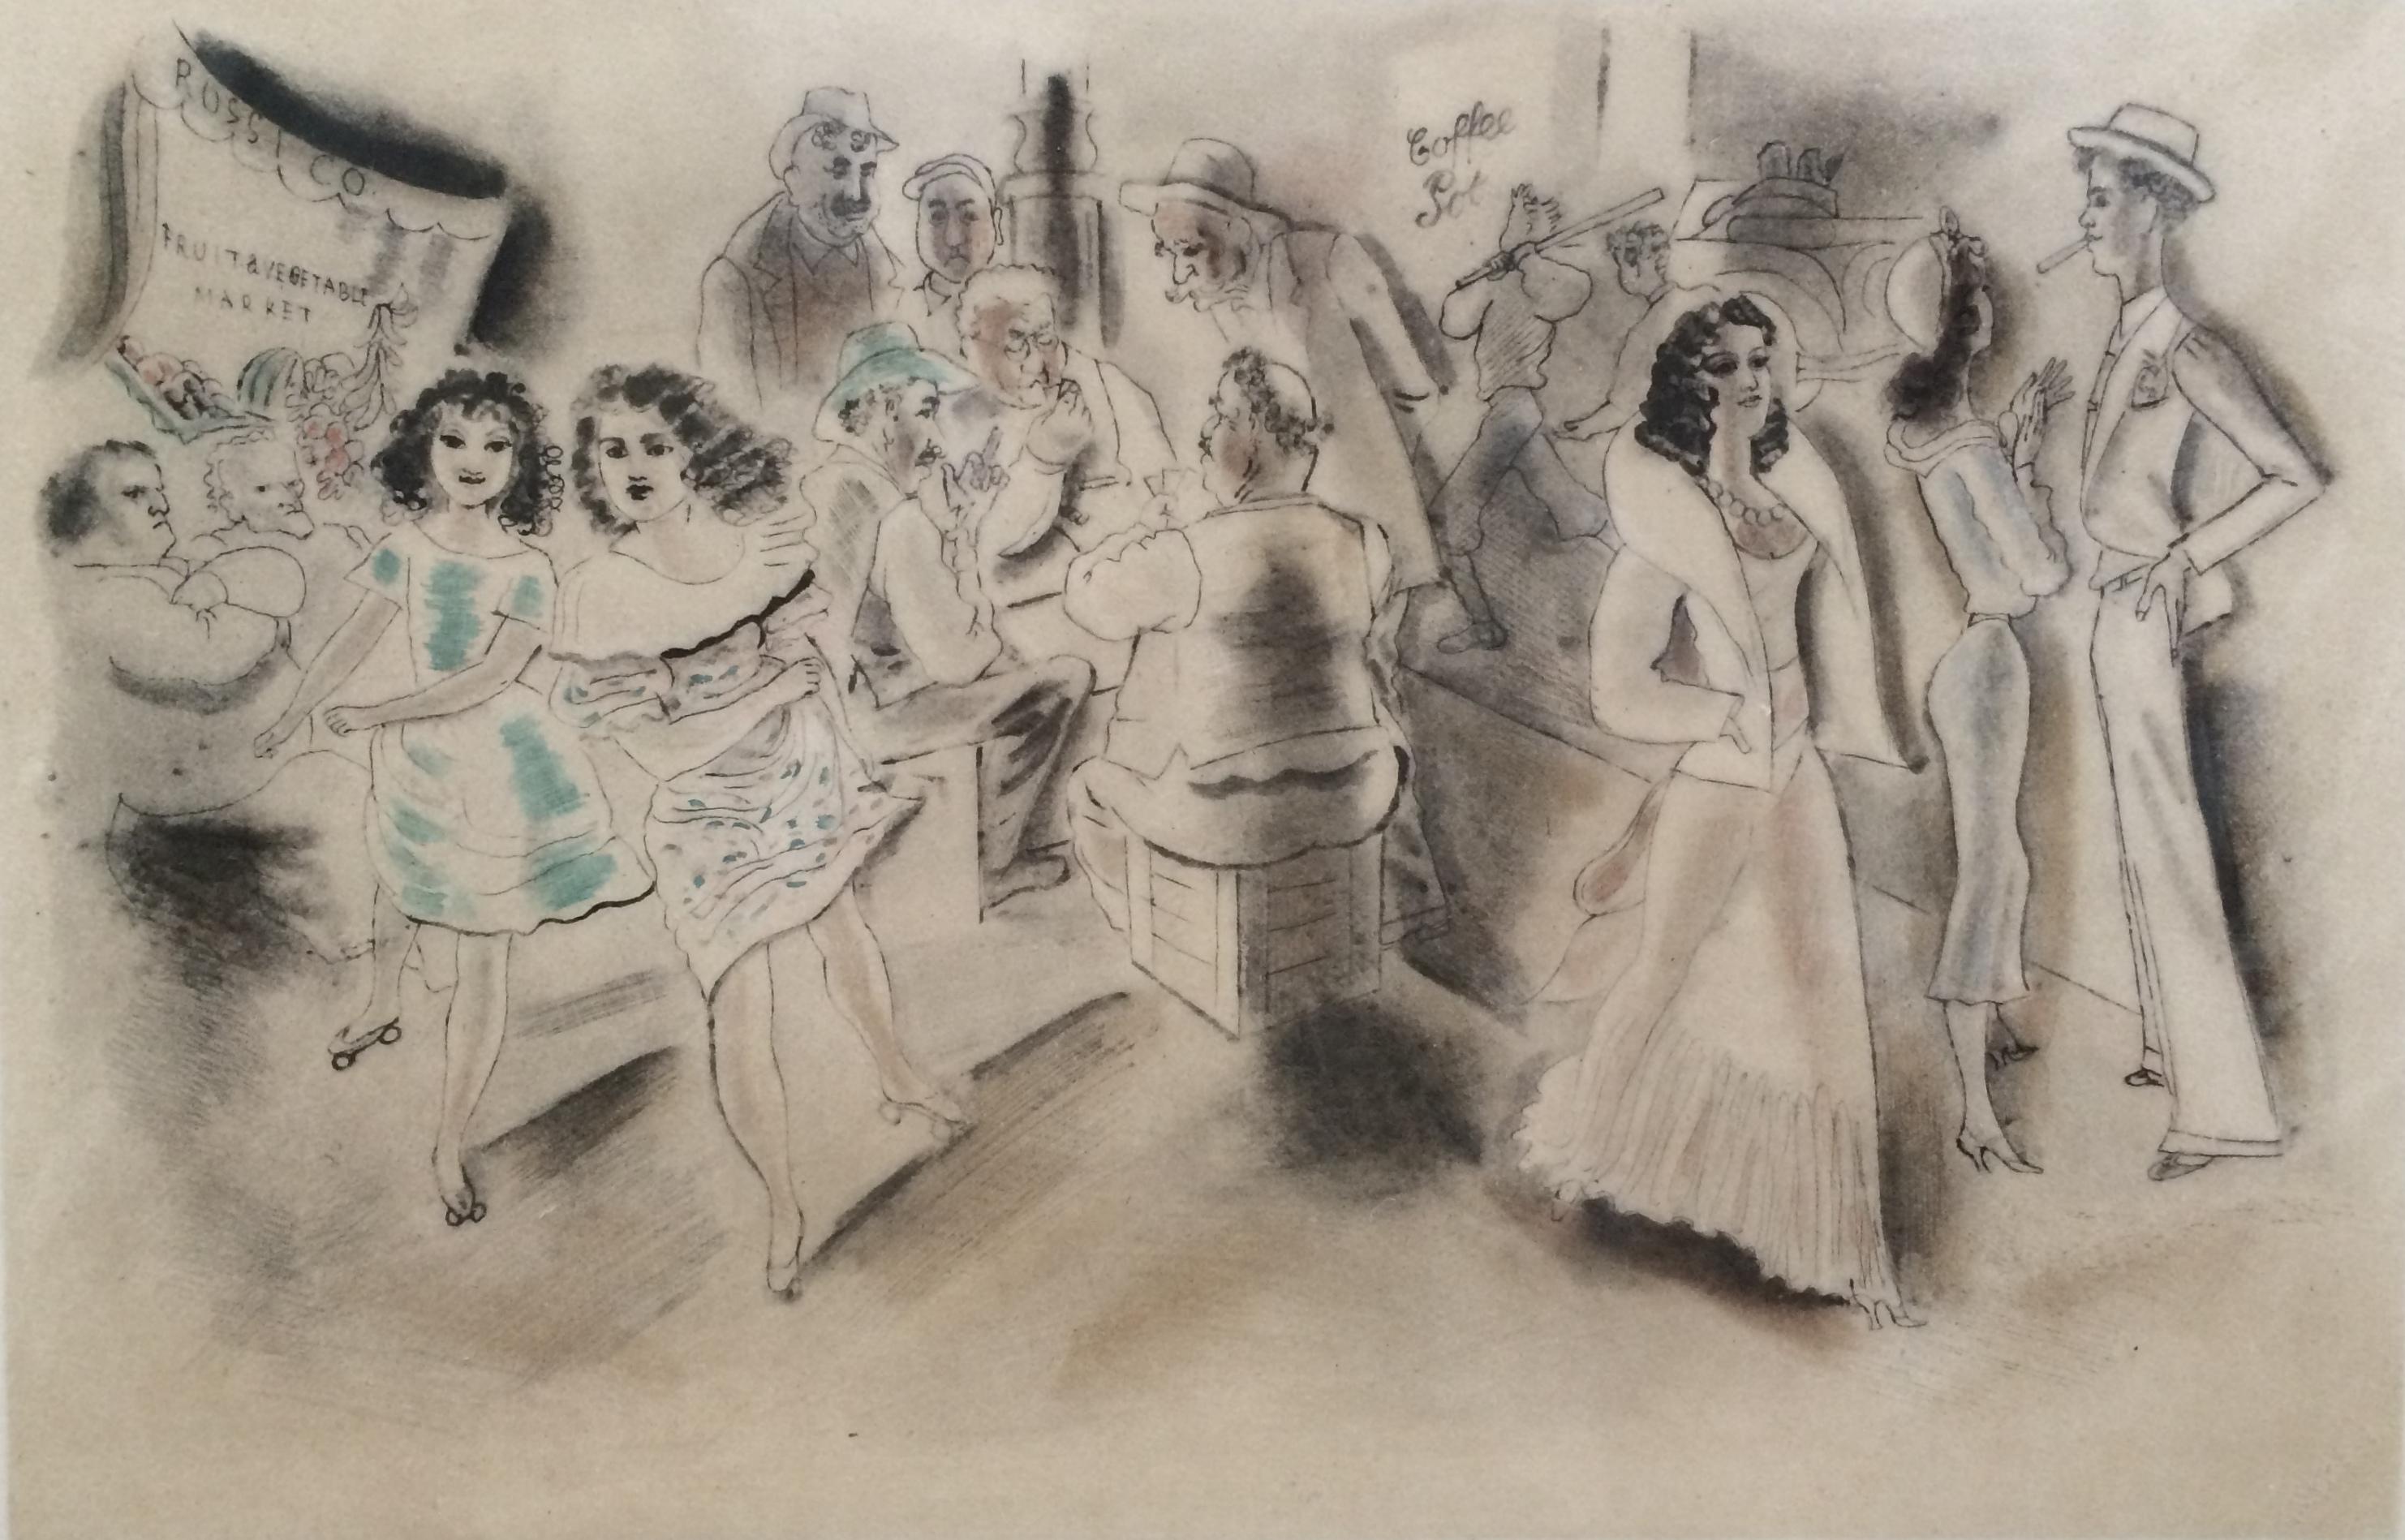 Chas.Laborde 1886-1941